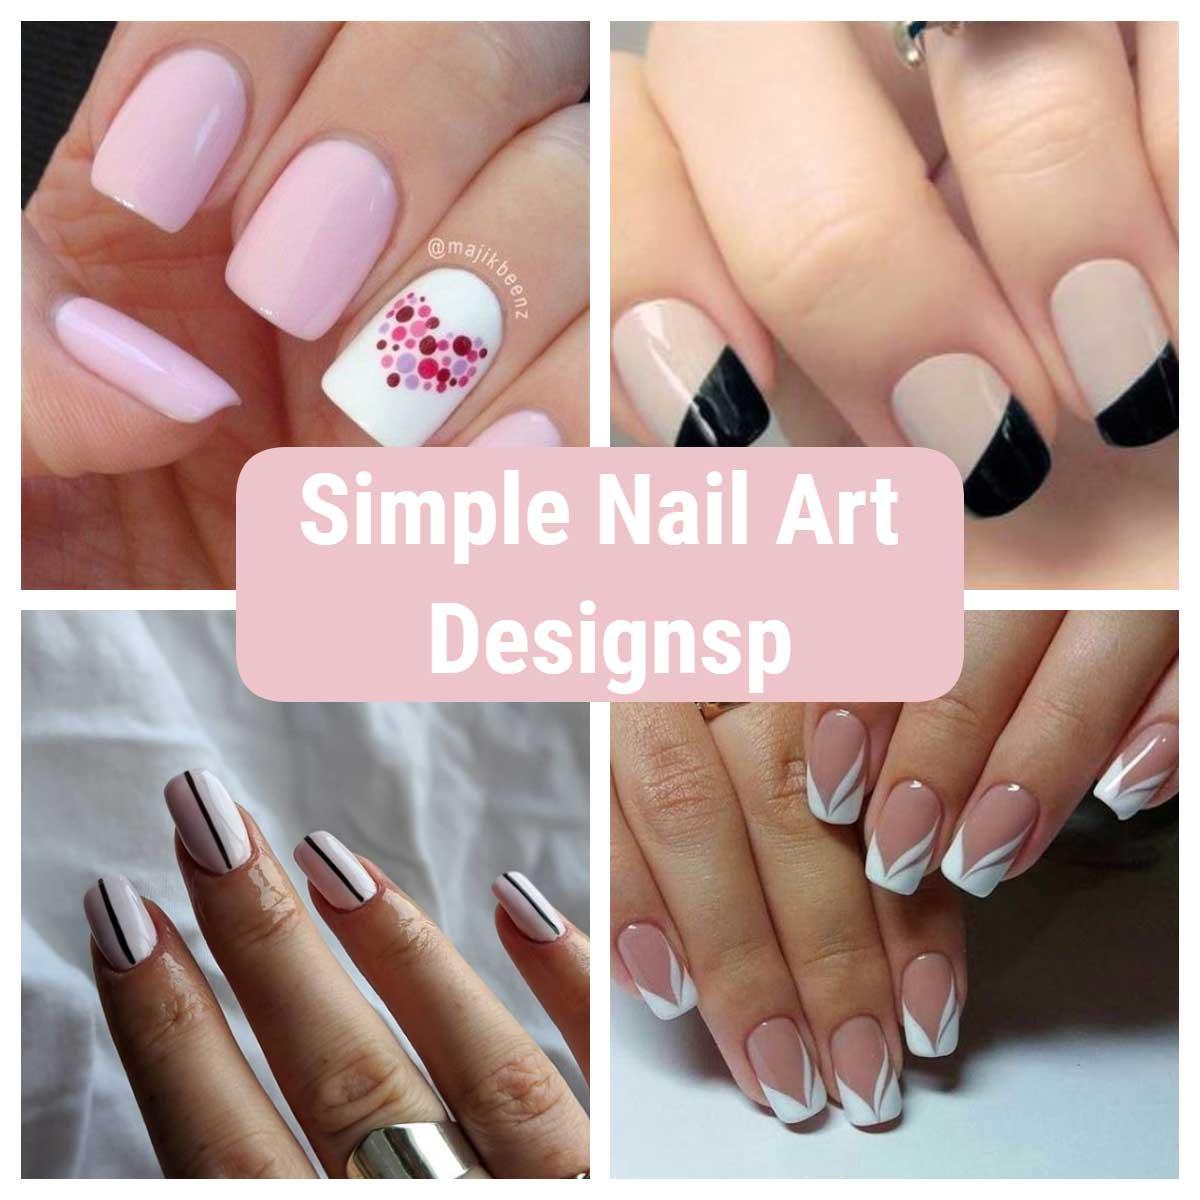 Simple Nail Art Designs Nail Art 4u